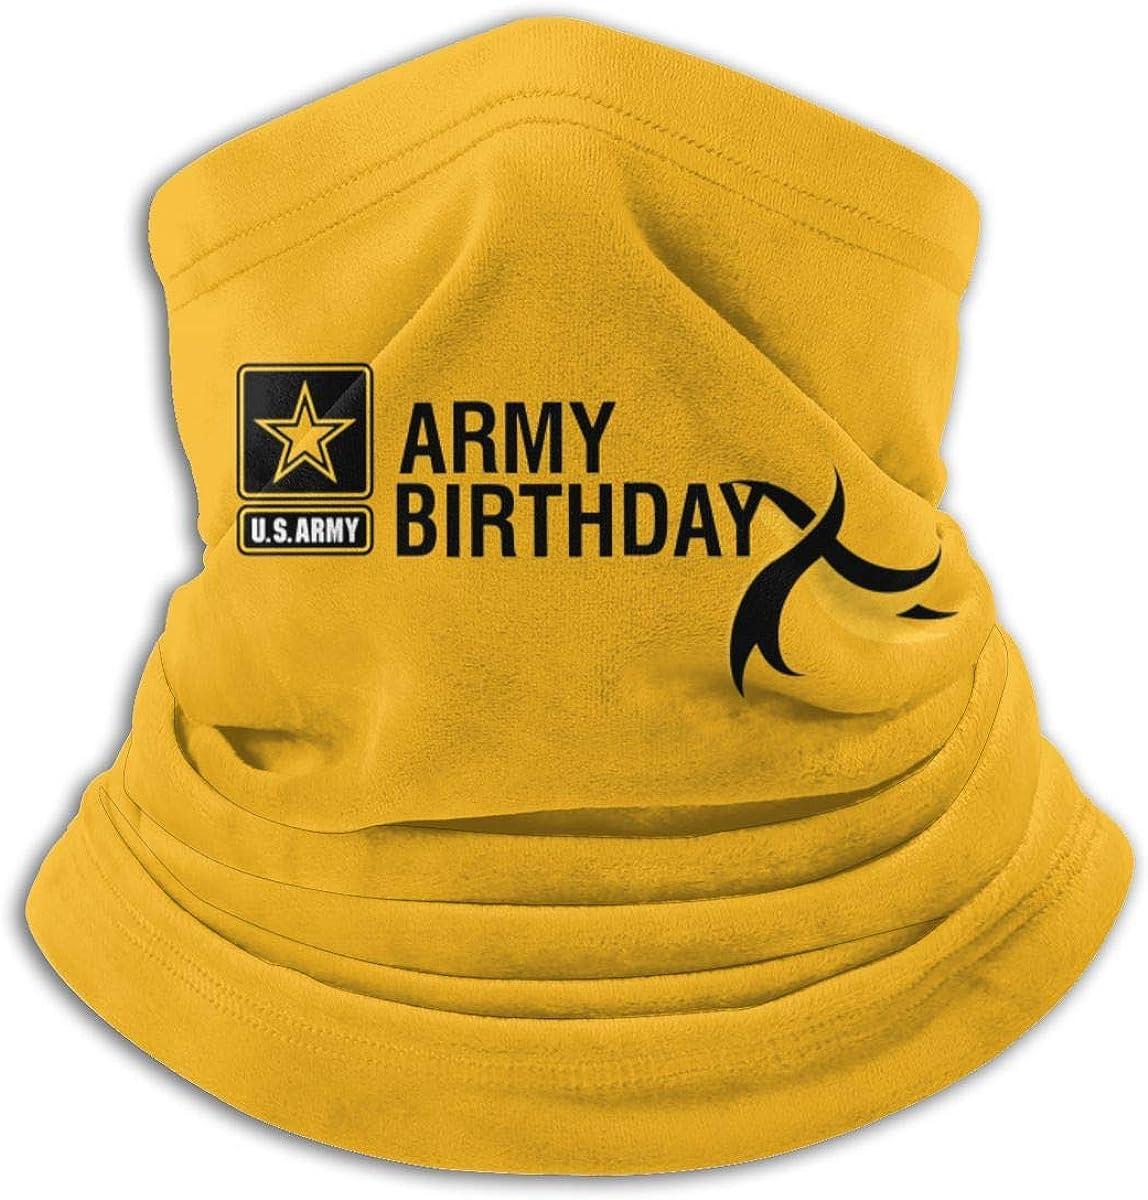 Us Army Birthday Black Multi-function Neck Warmer Gaiter Polyester Neck Warmer Windproof Winter Neck Gaiter Cold Weather Scarf For Men Women